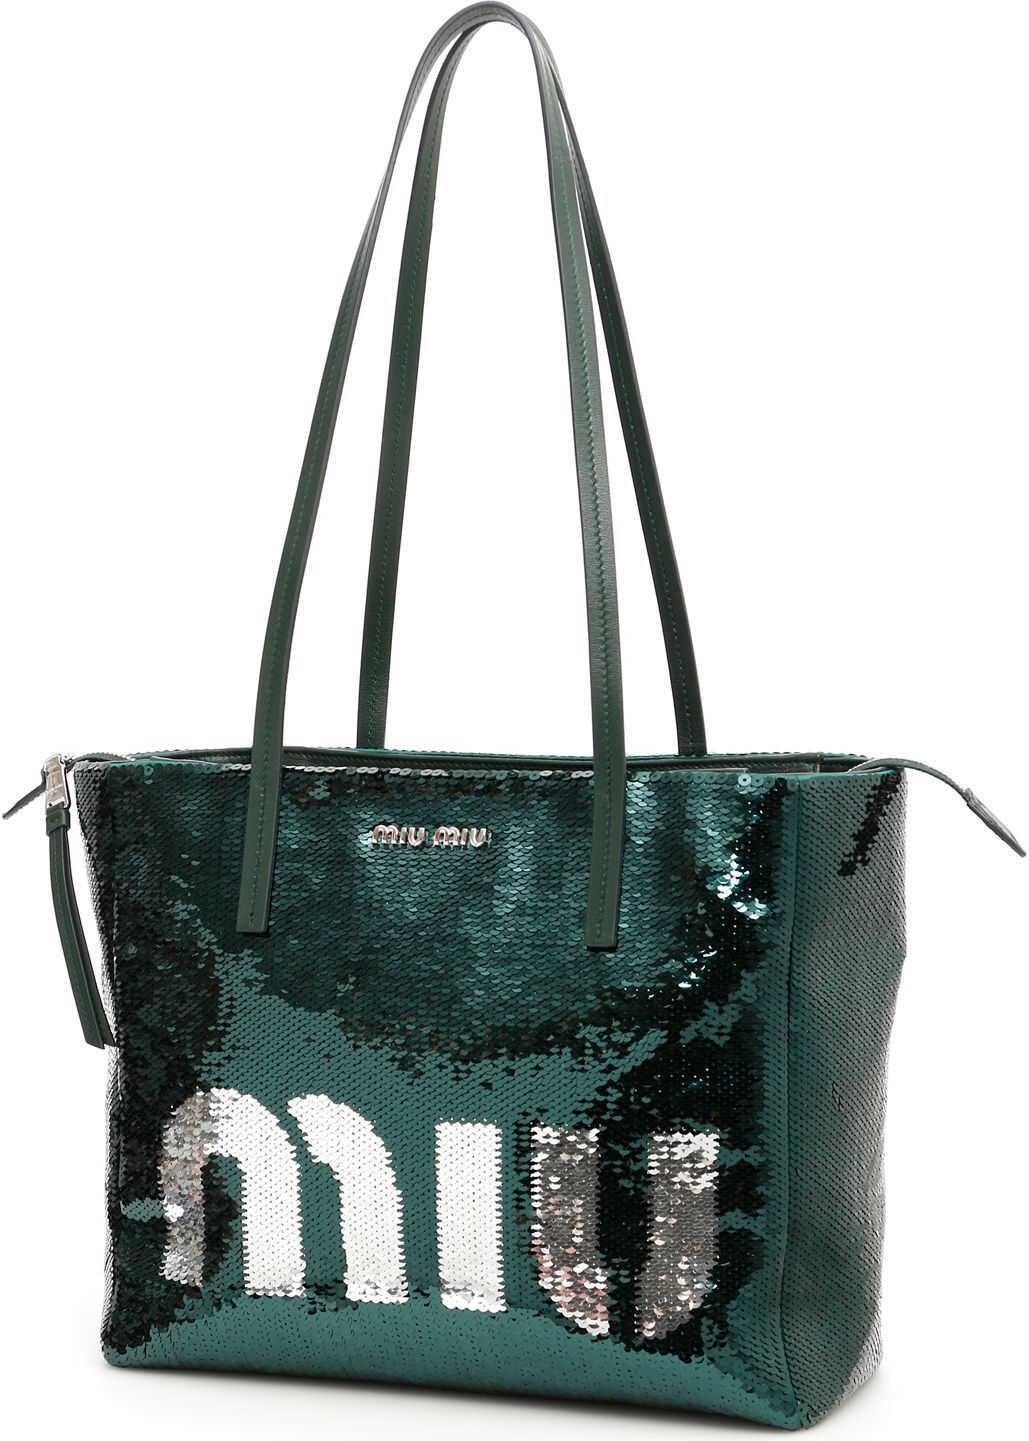 Miu Miu Sequins Logo Shopping Bag SMERALDO ARGENTO